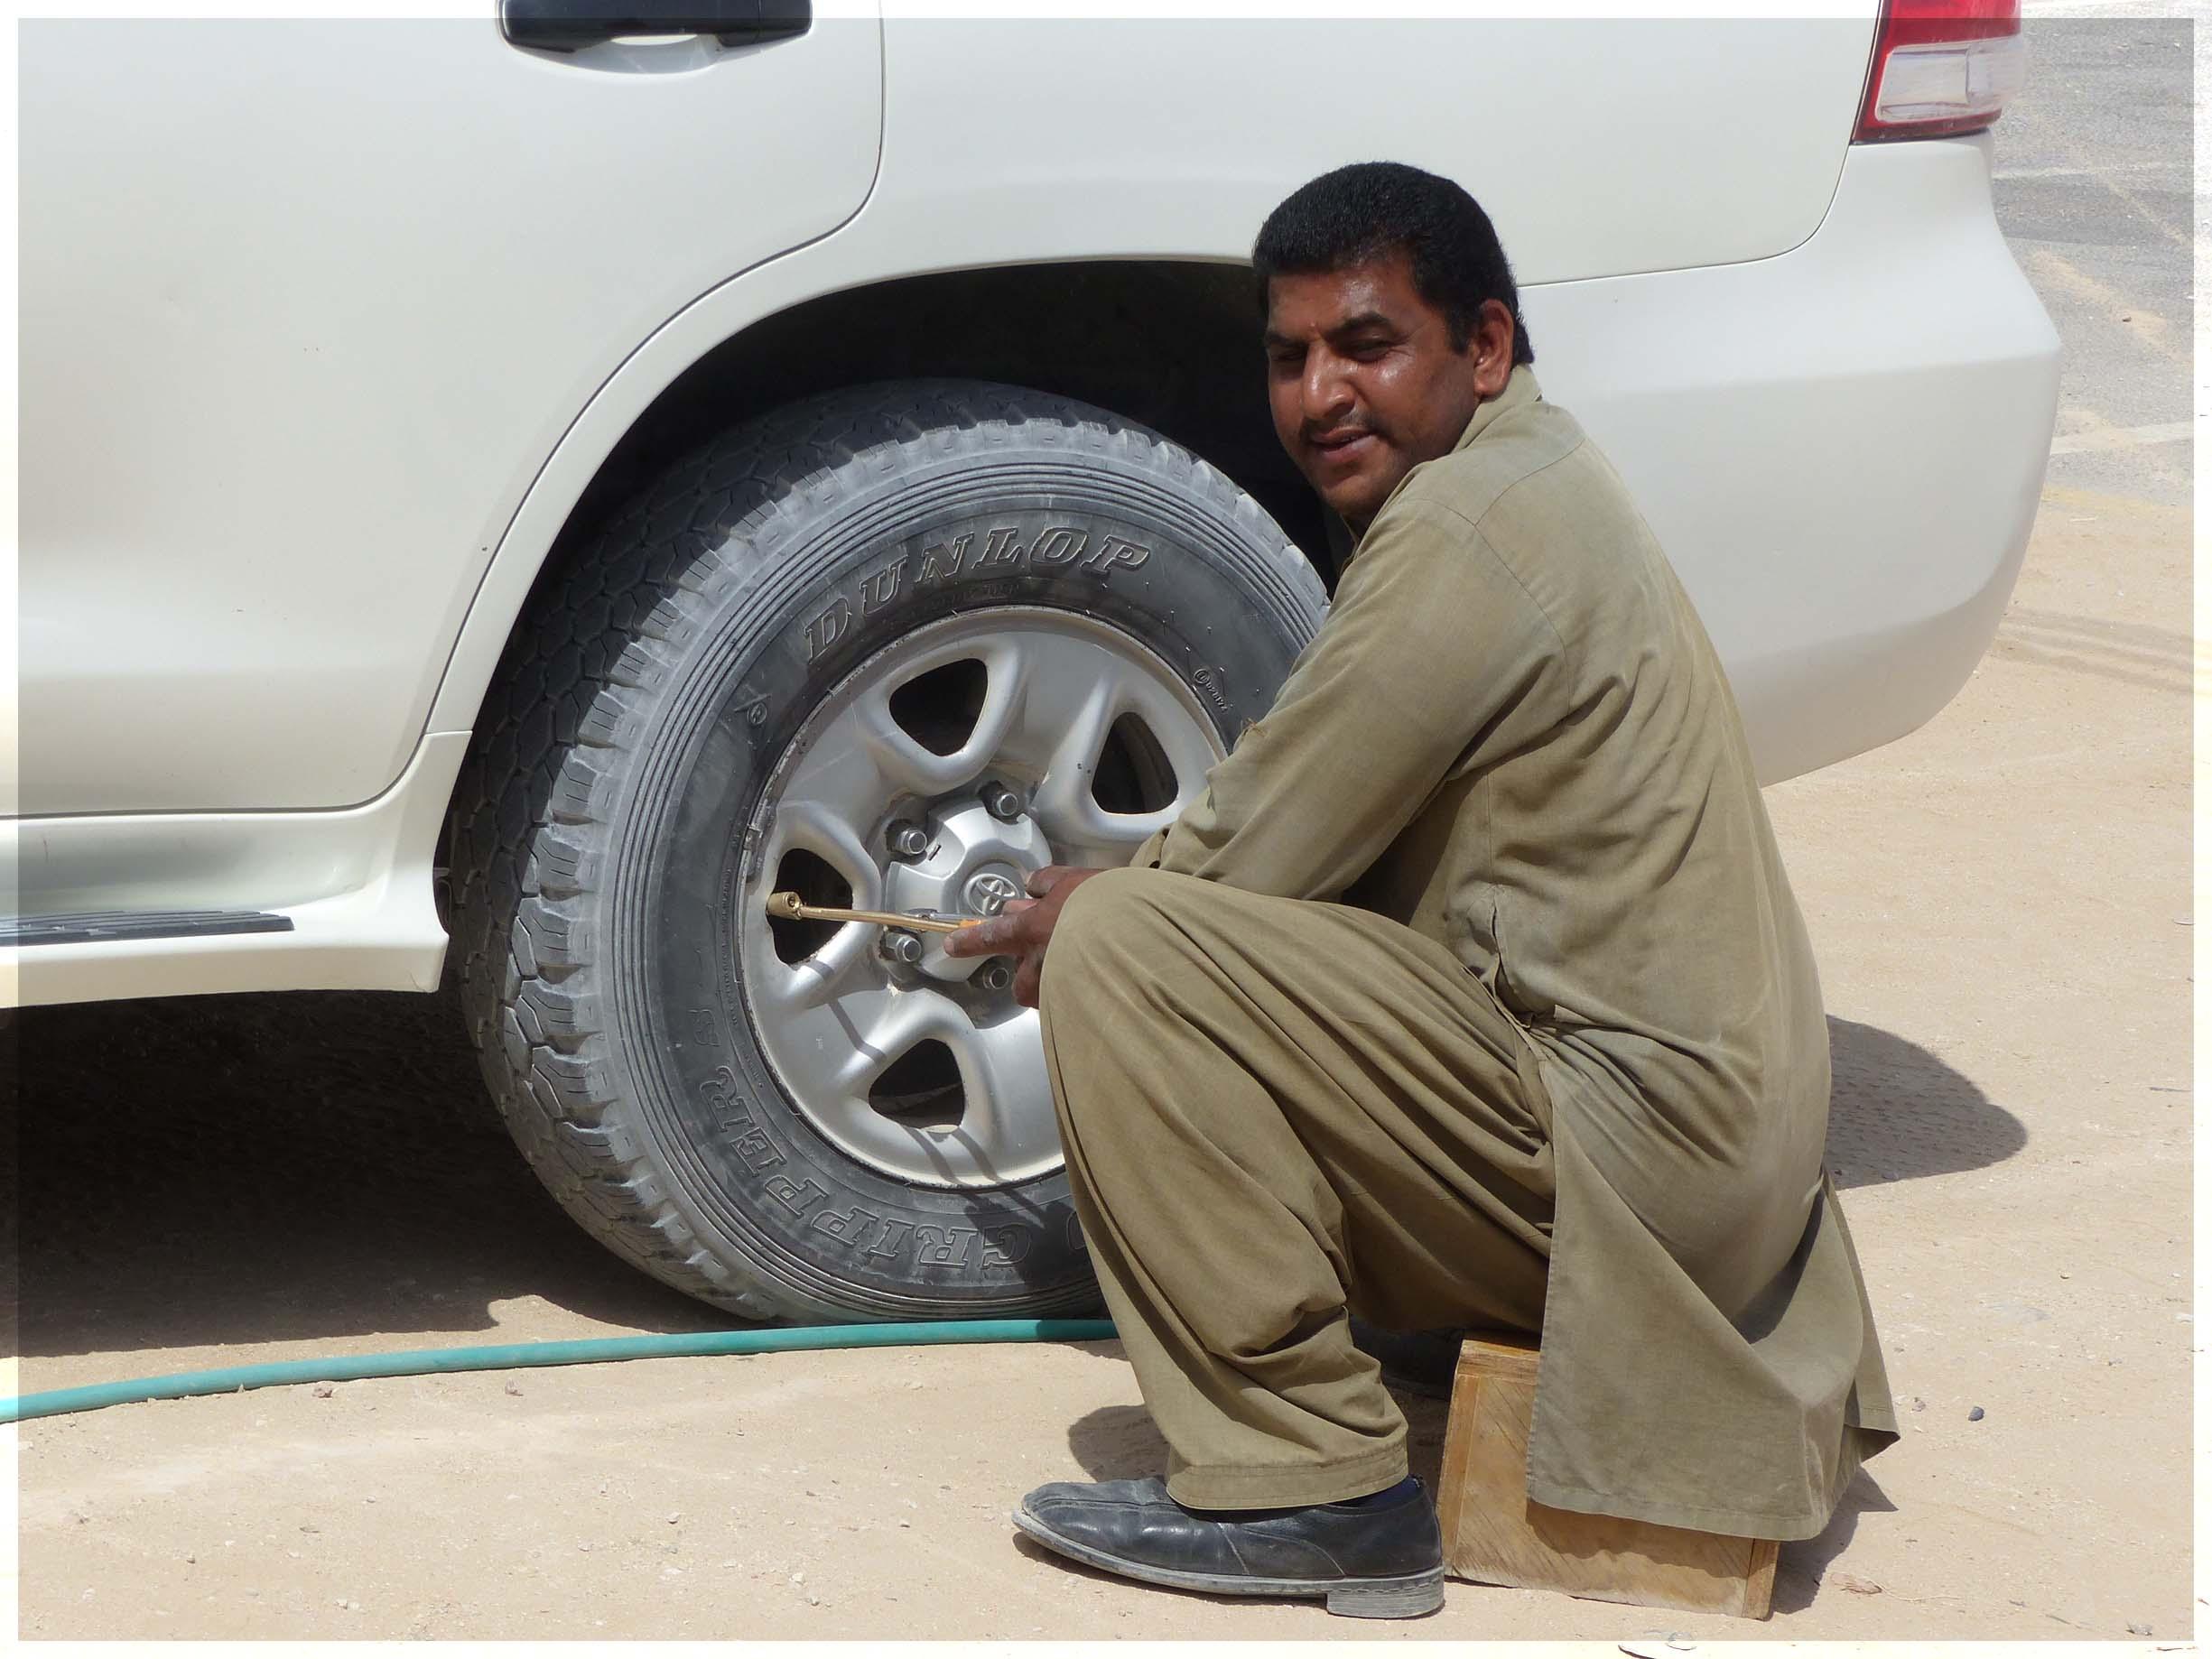 Man pumping up a tyre